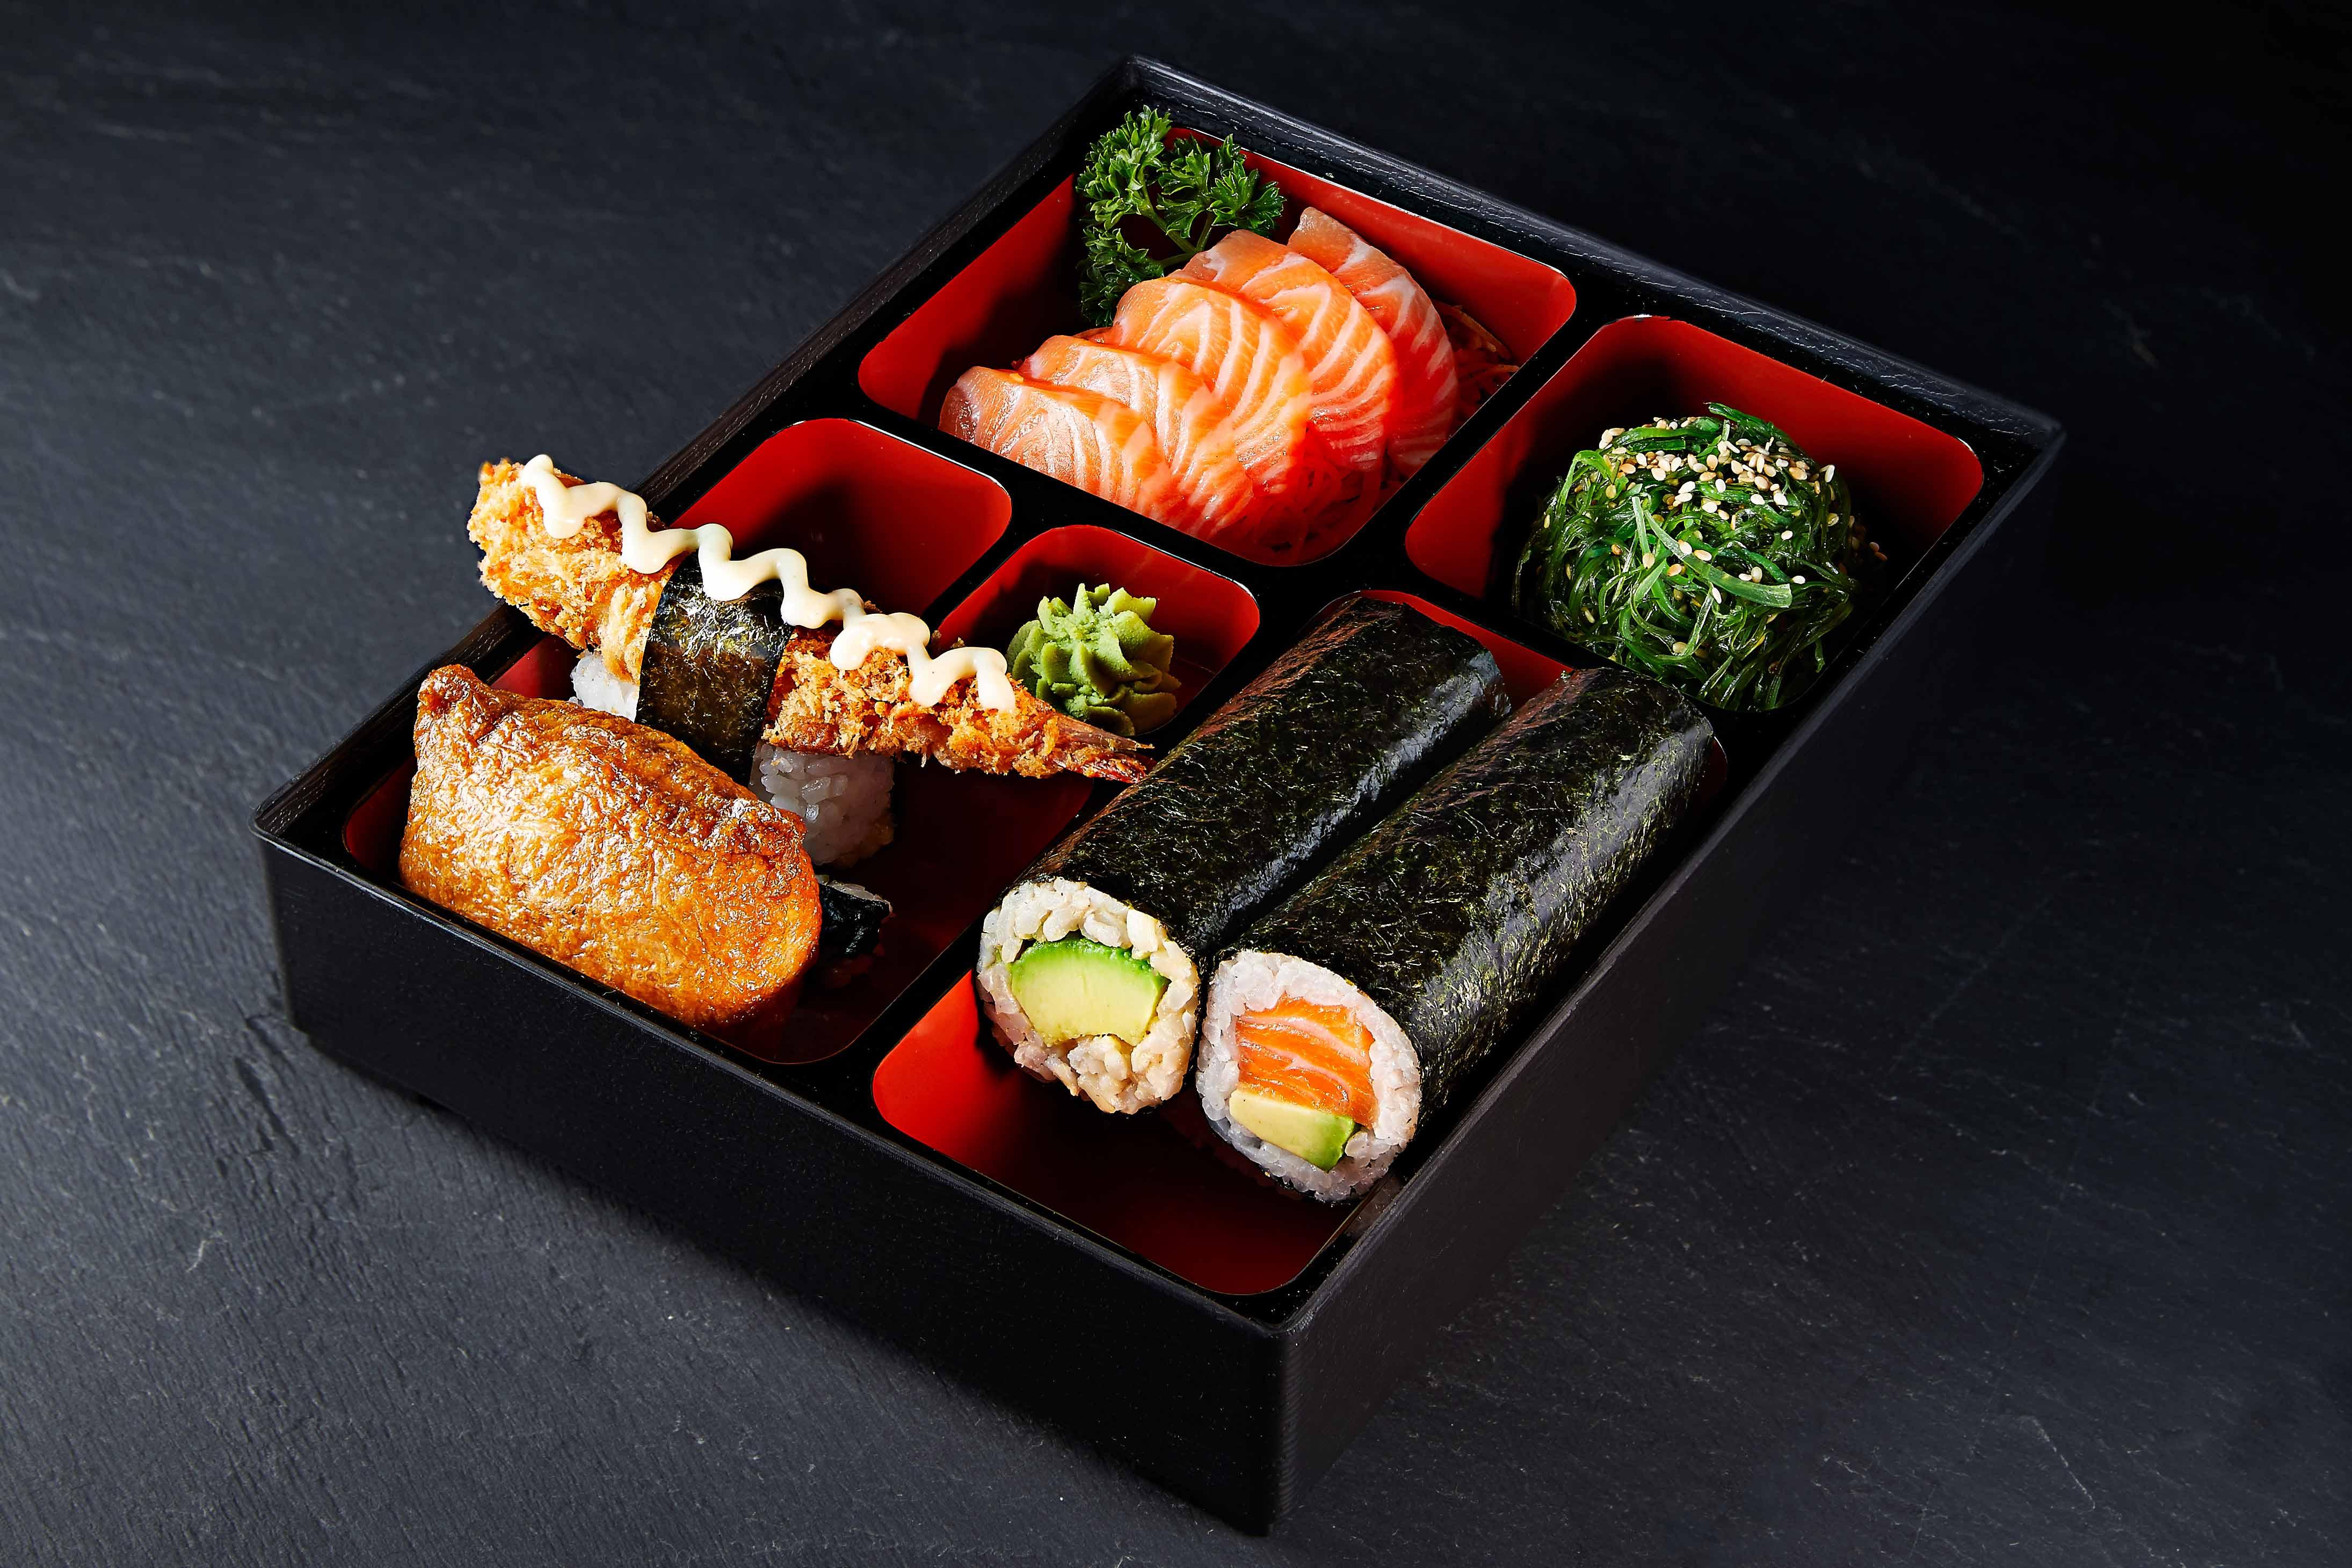 Bento Box from Sushi Izakaya